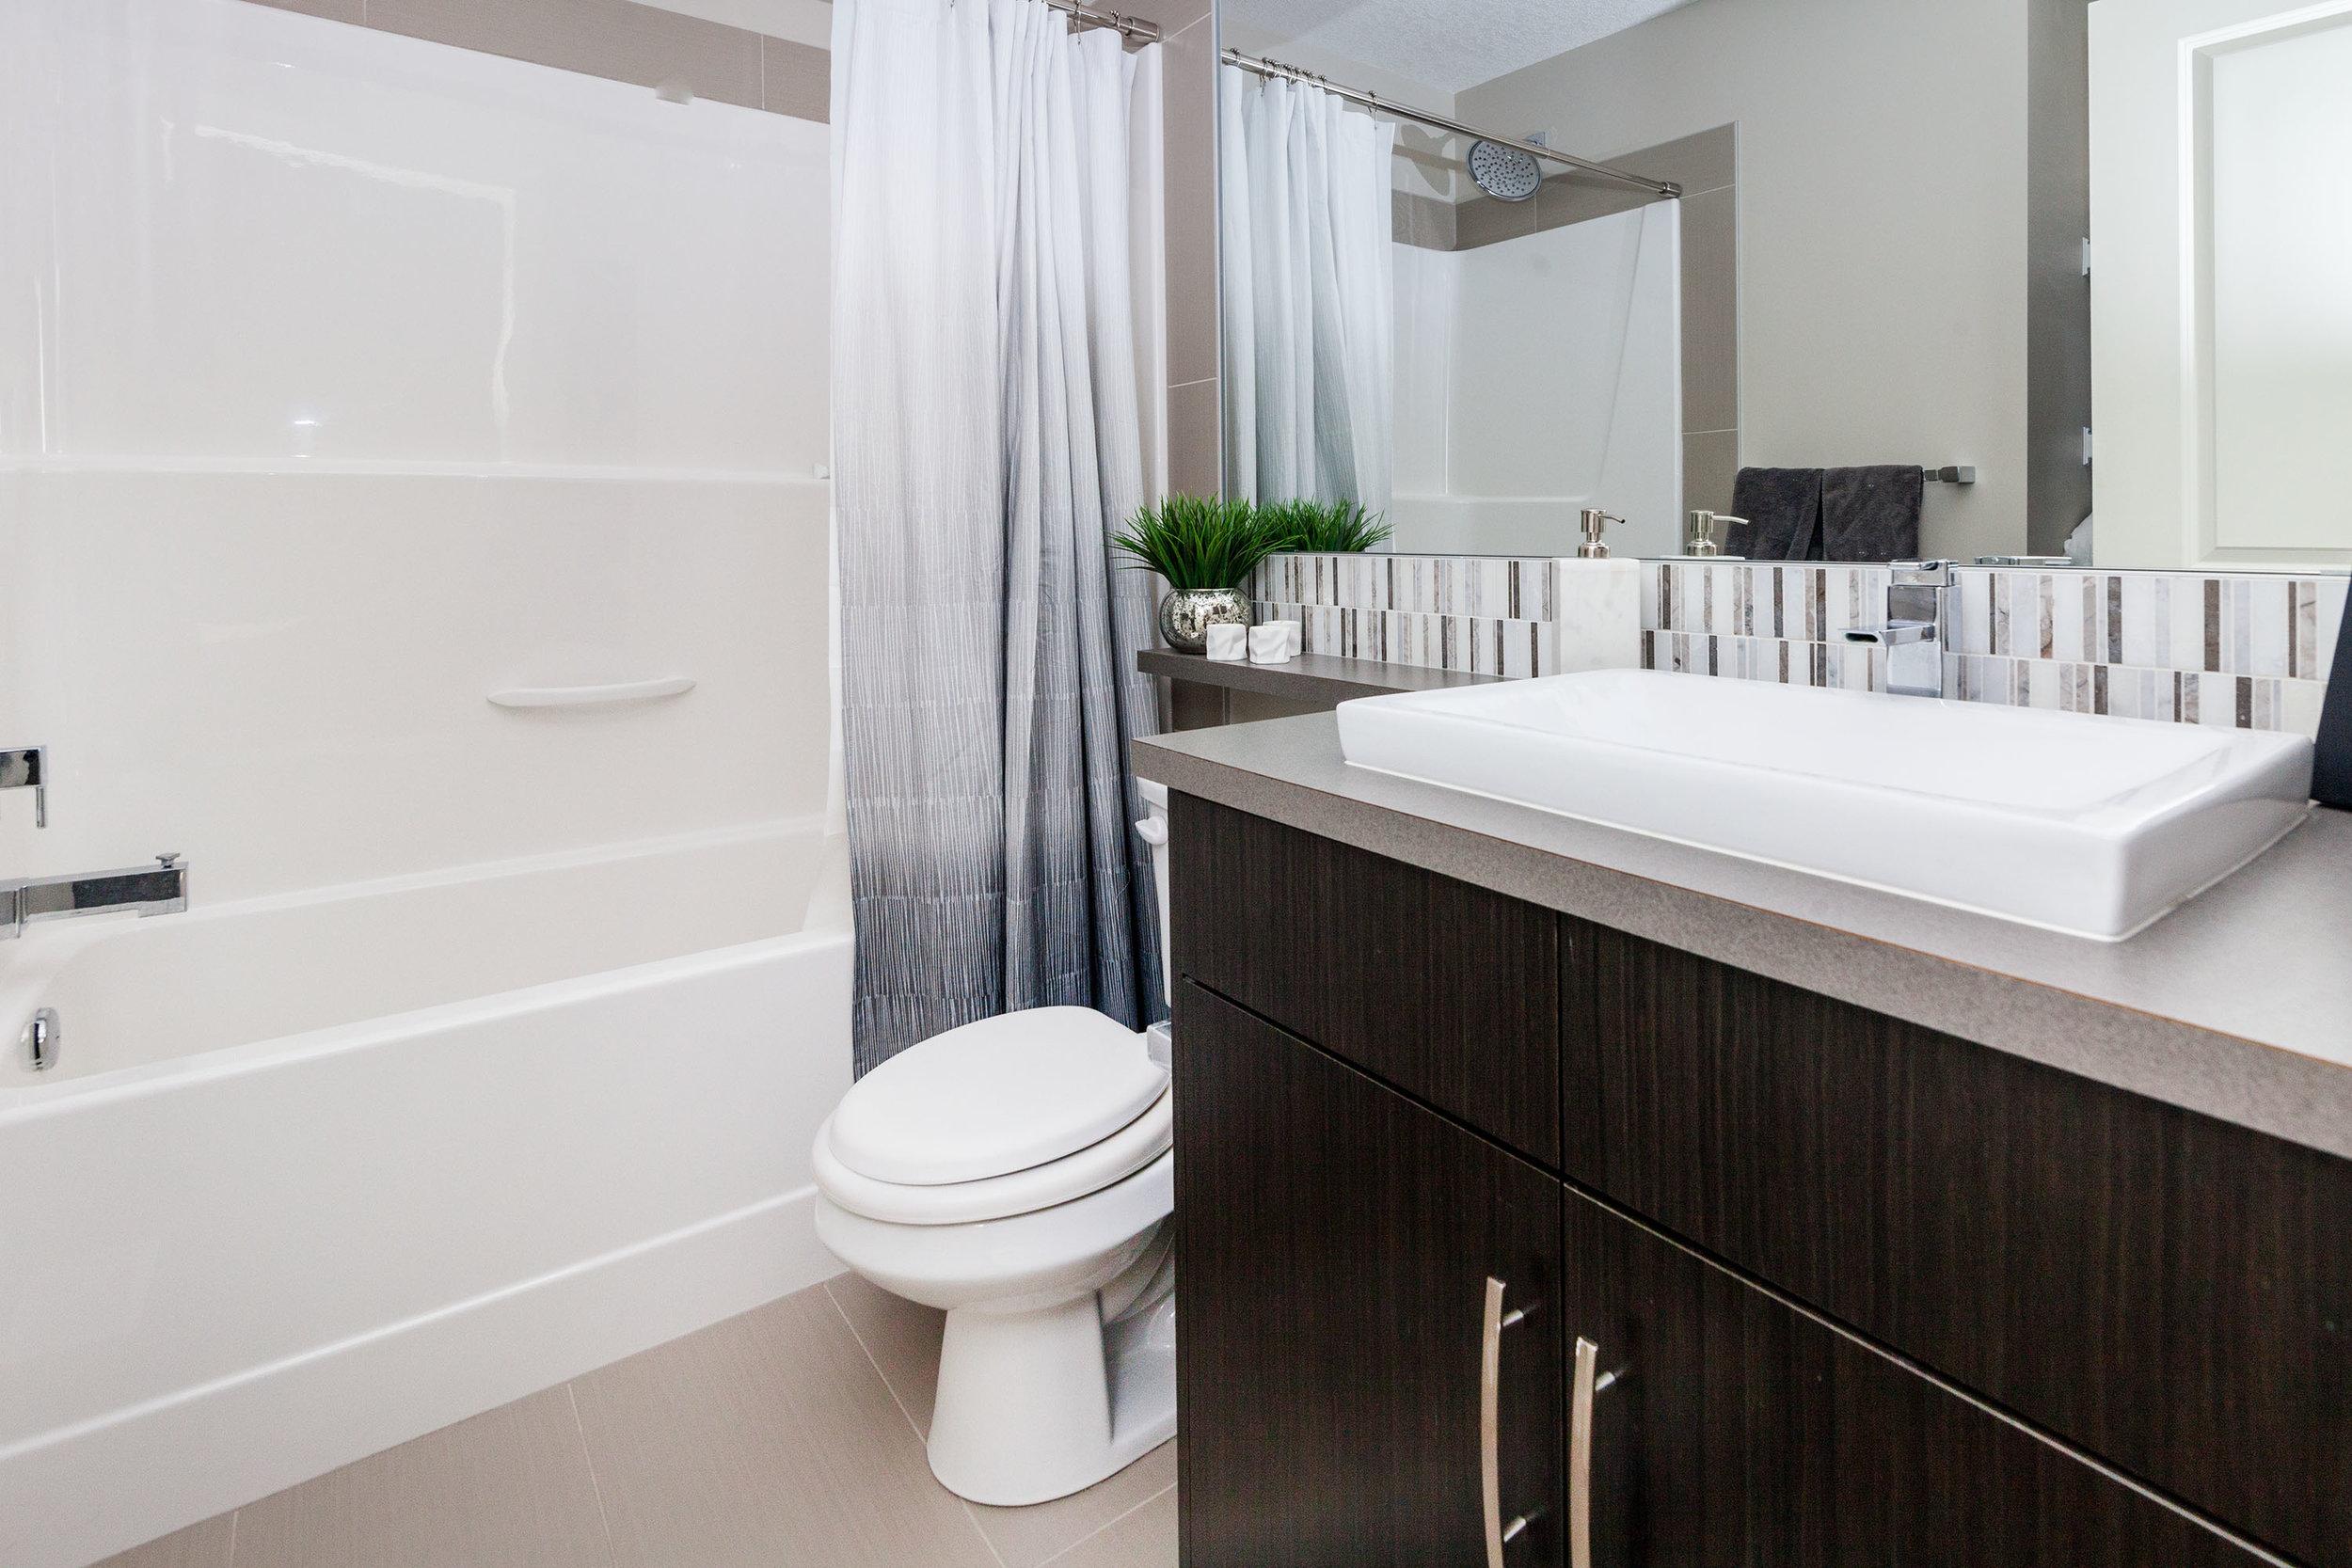 Basement bathroom with tub